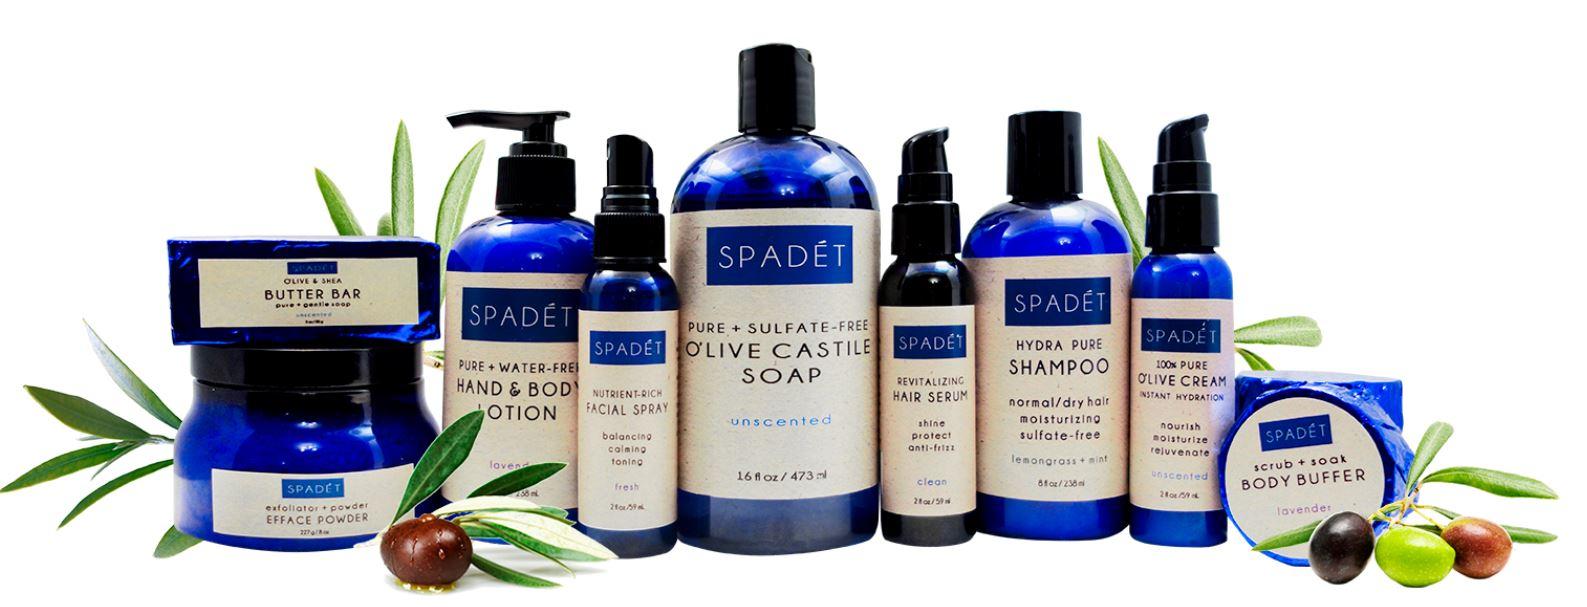 spadet-products-wealf